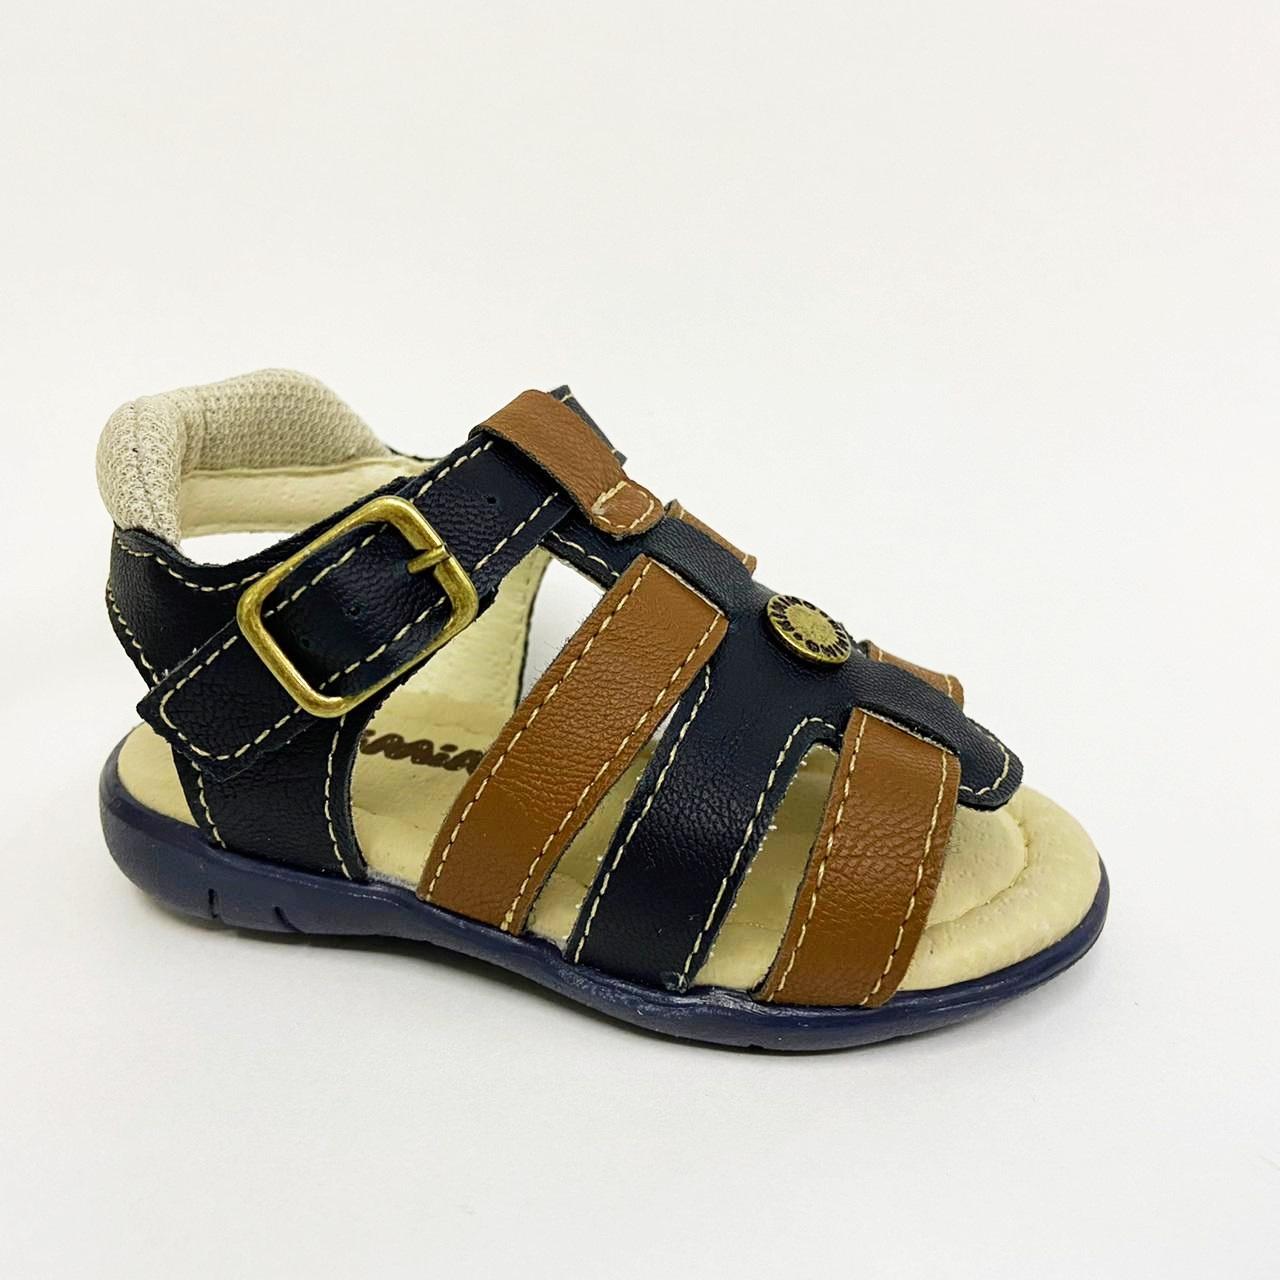 Sandalia Infantil Masculina Kimimo 265-137 - Marinho